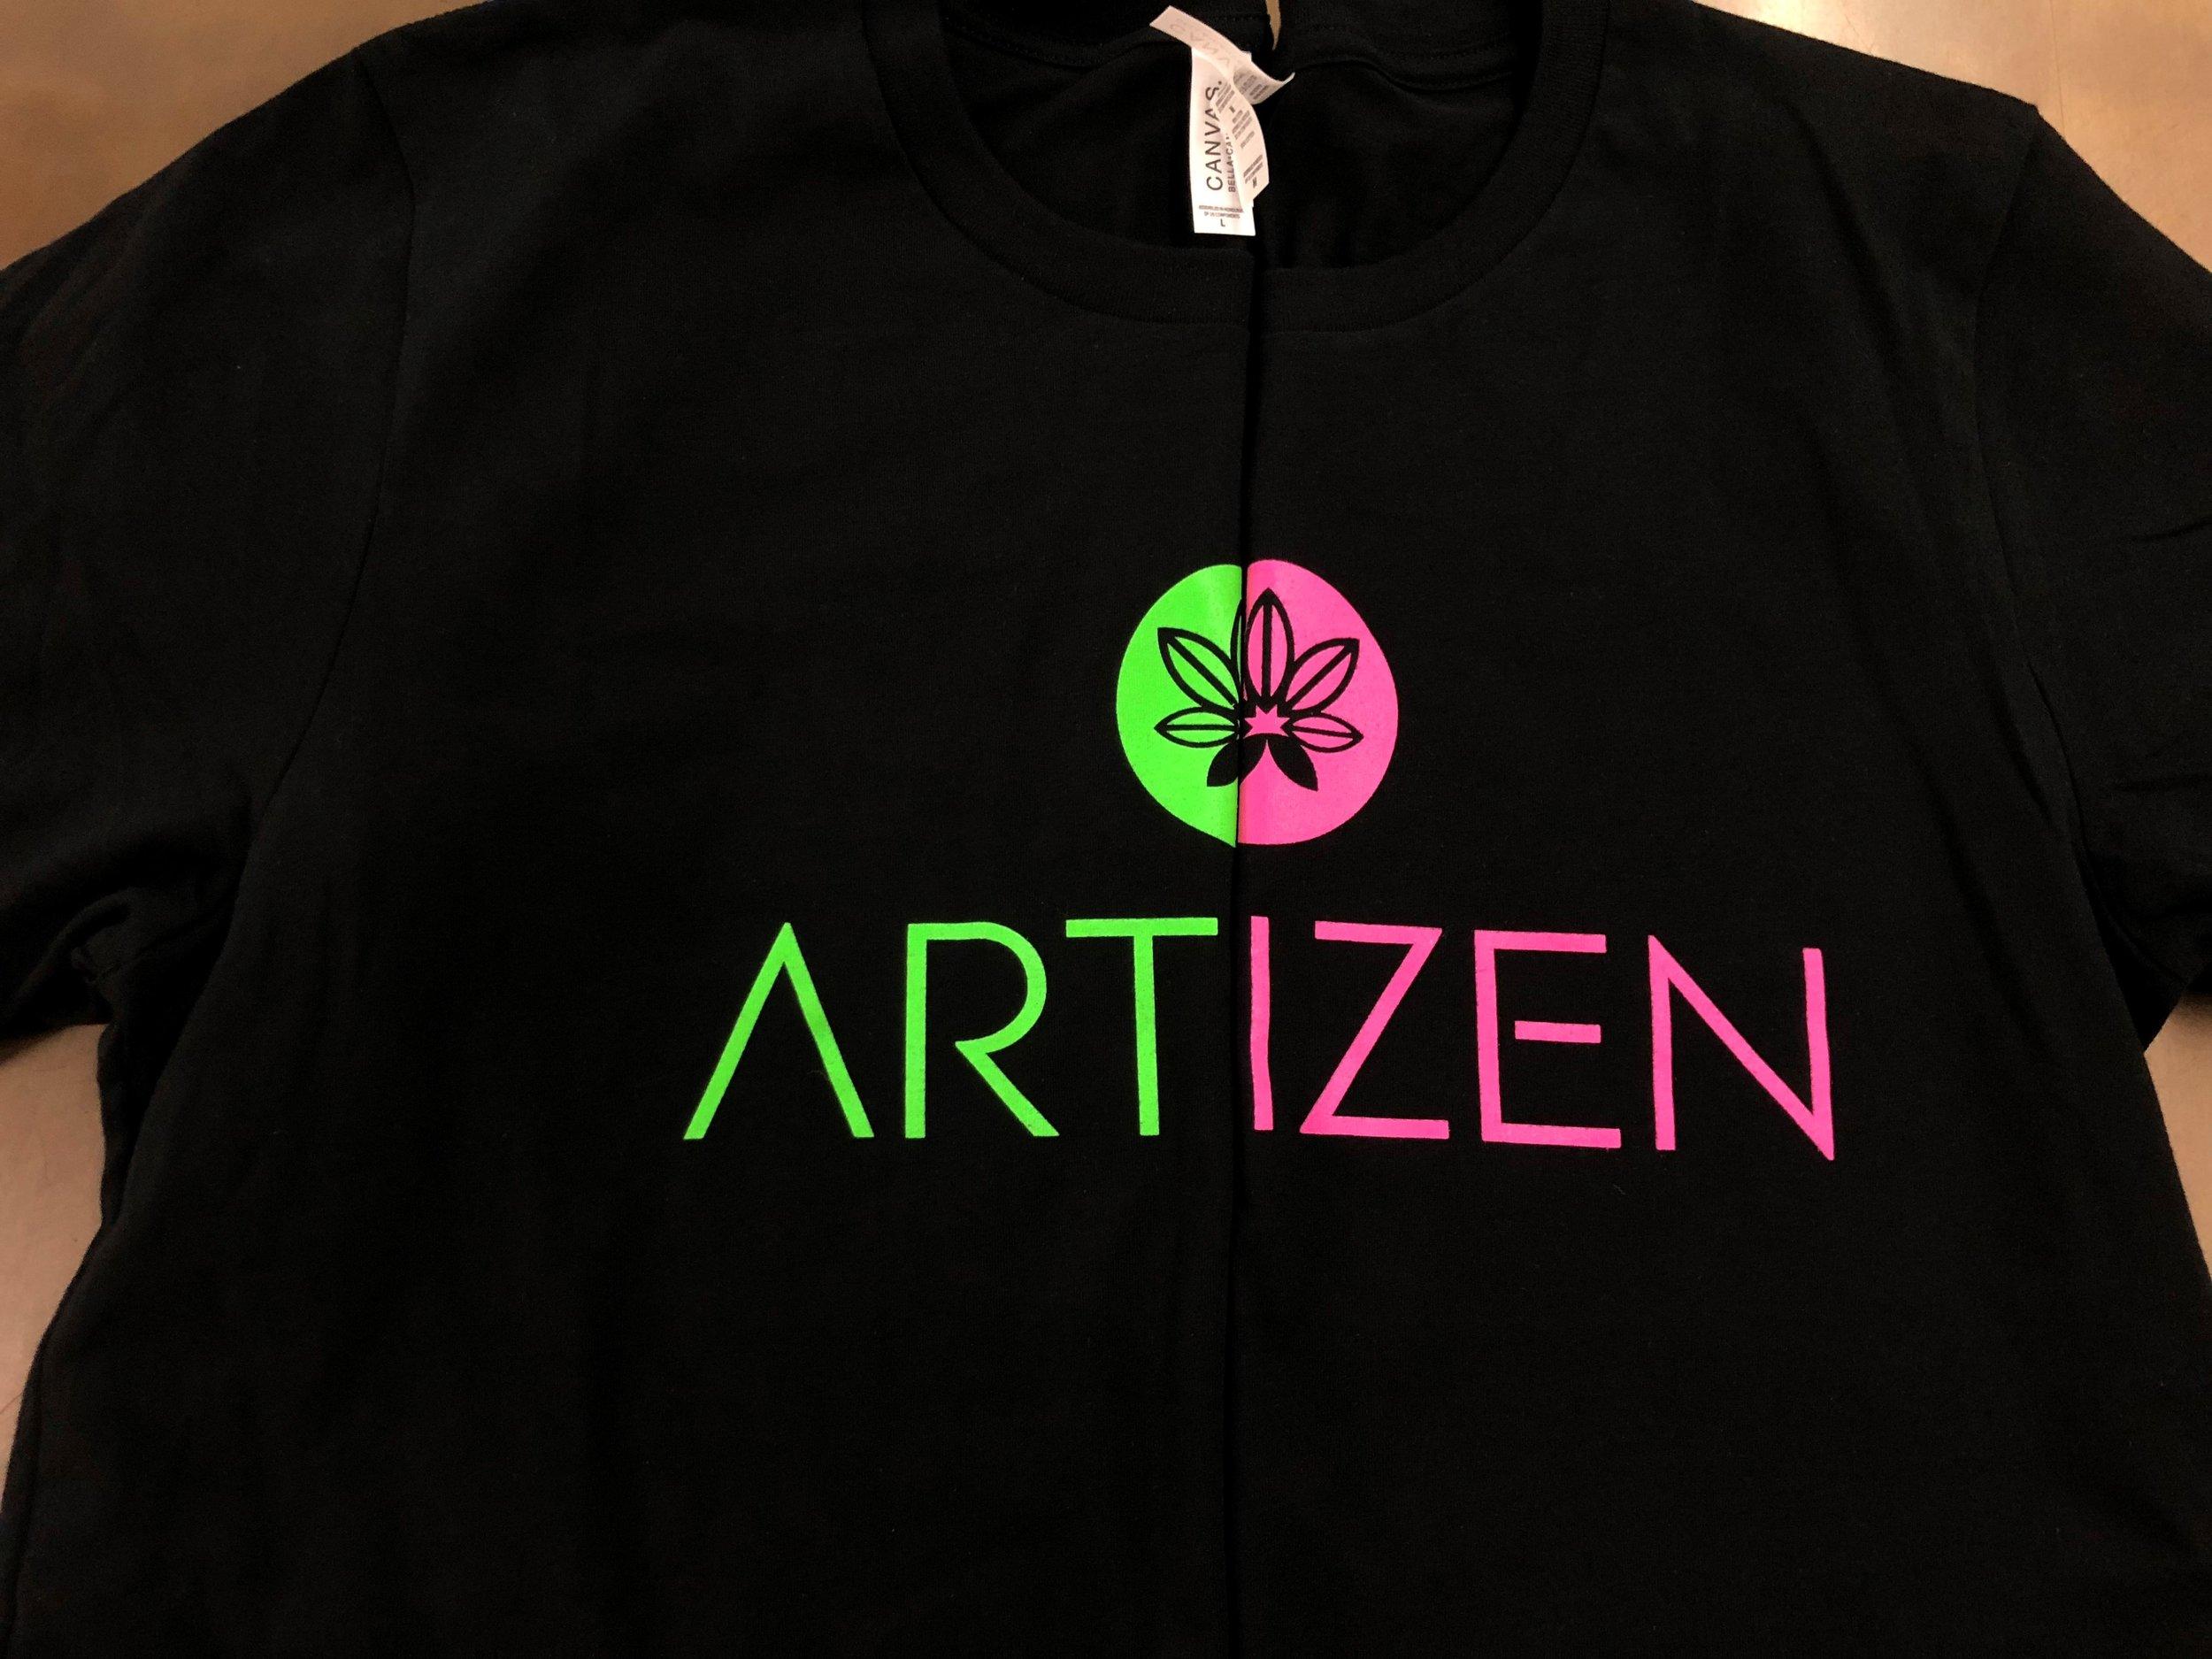 logounltd_laser_etching_embroidery_screen_printing_apparel_uniform_custom_tshirts_dye_sublimation_kirkland_bellevue_seattle_redmond_branded_merchandise_promotional_products_logo_unltd_artizen_cannabis_420 (4).jpg